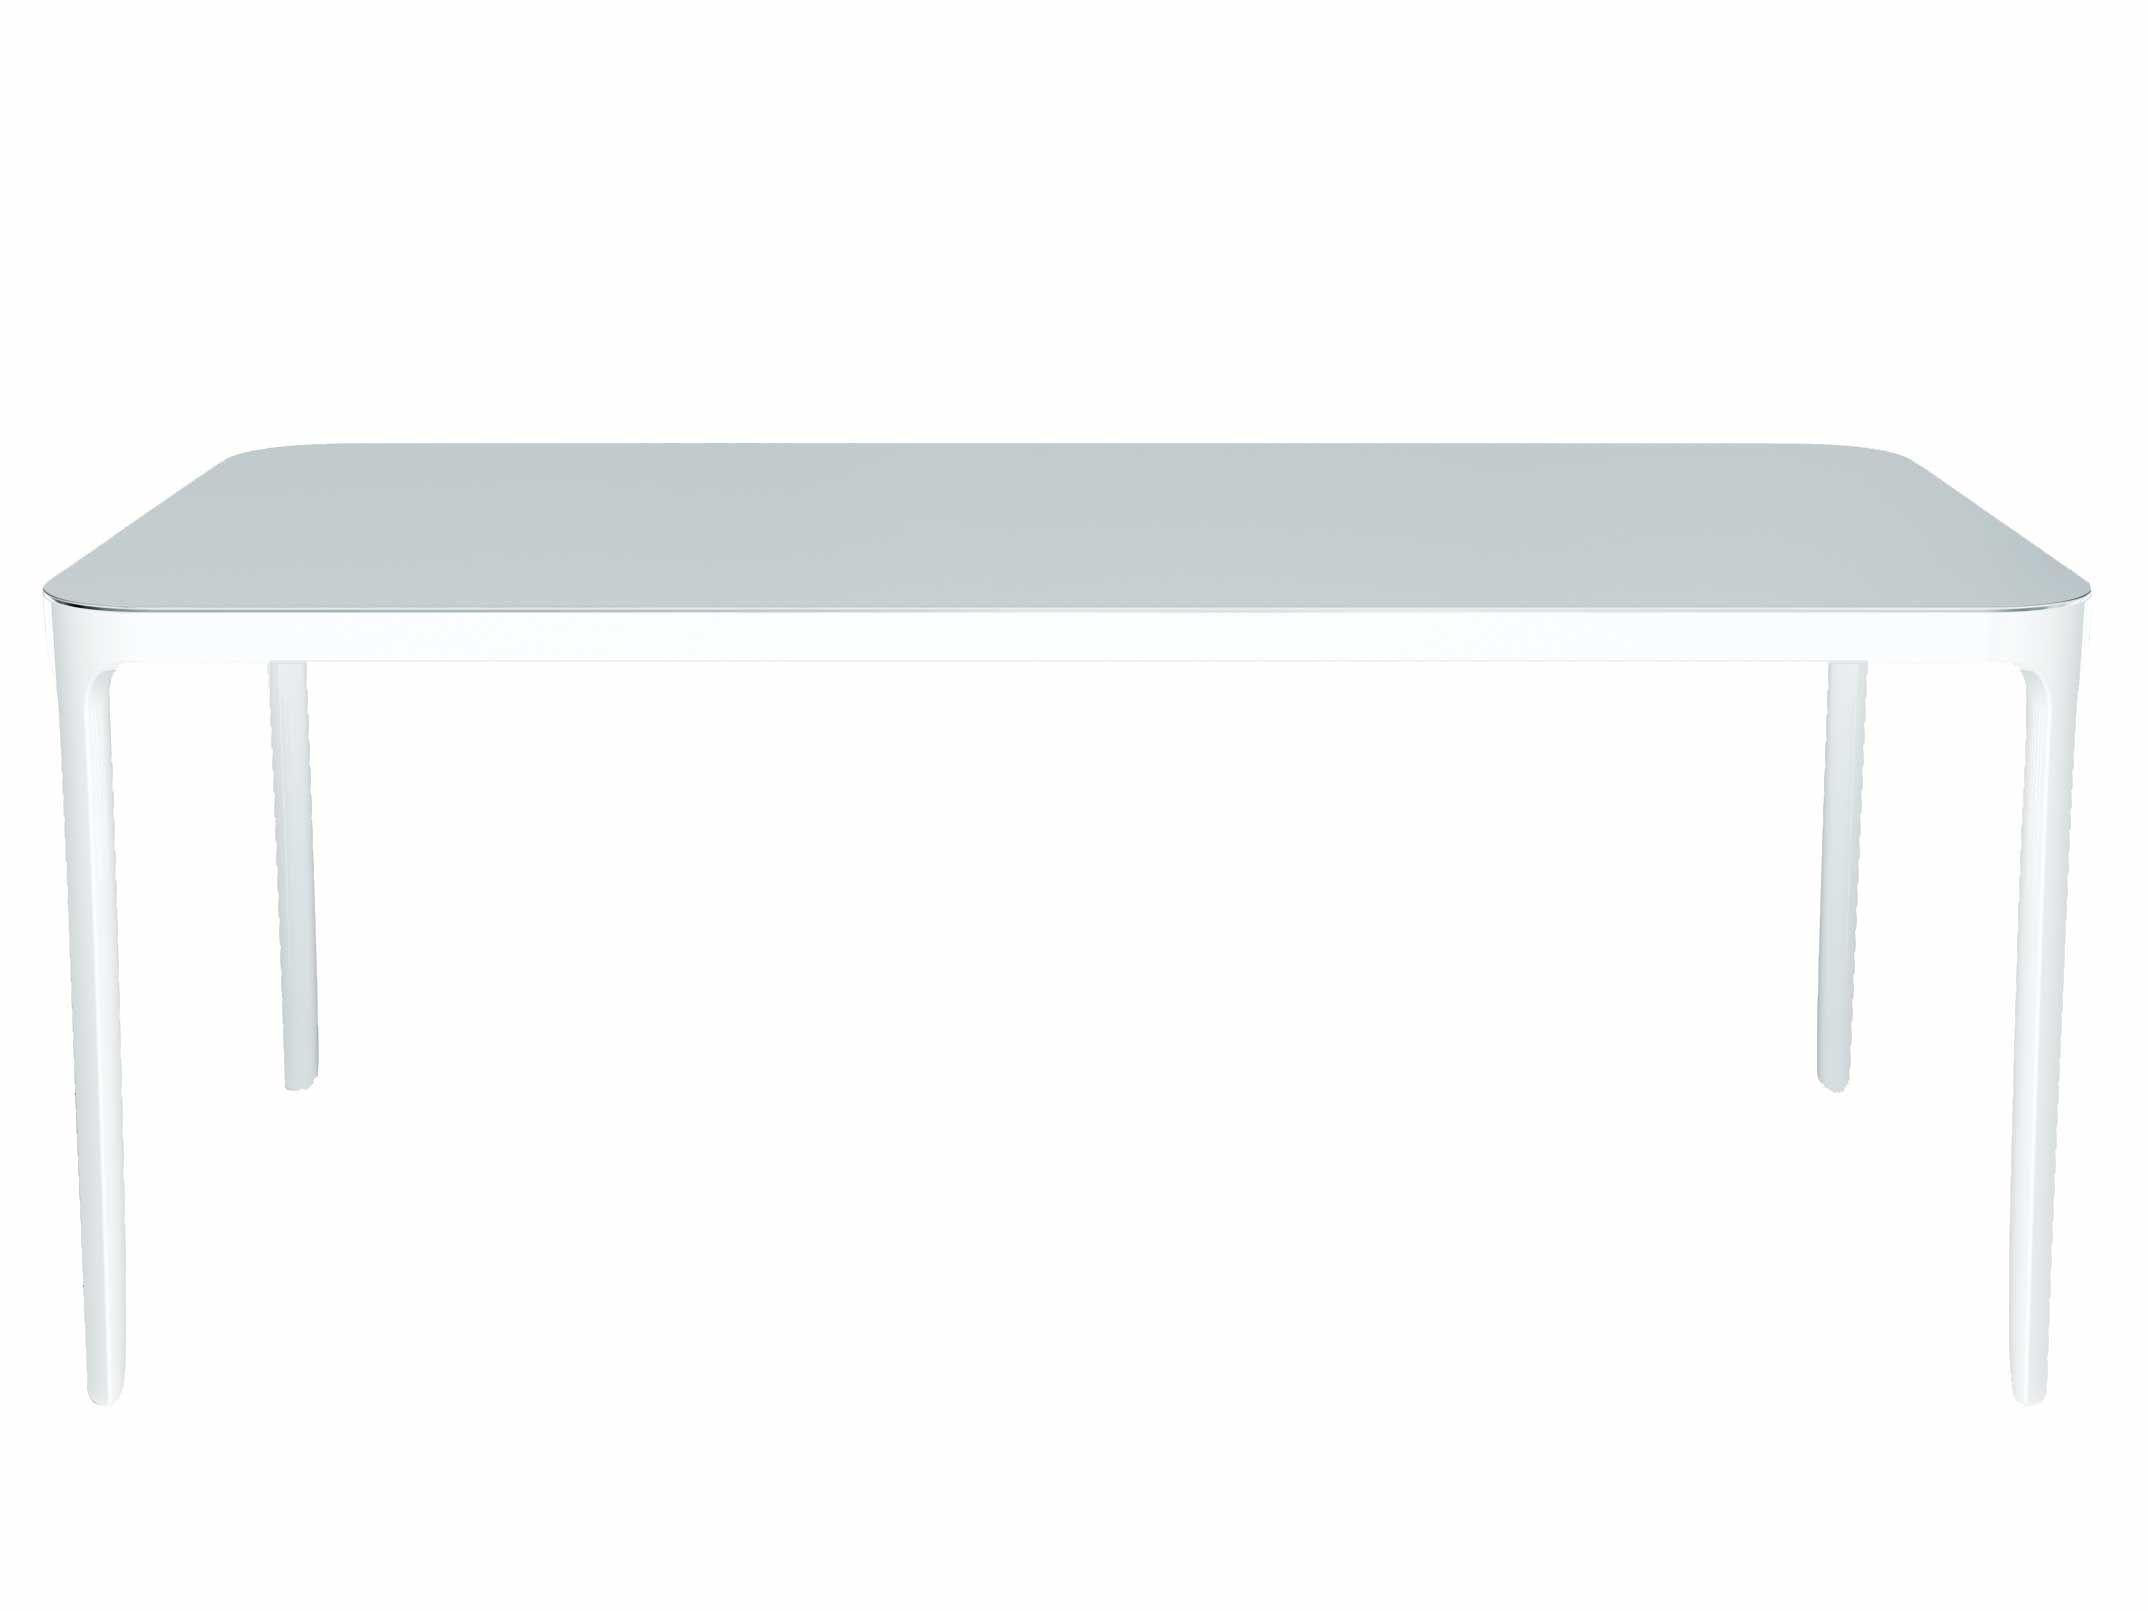 Furniture - Dining Tables - Vanity Rectangular table - Rectangular - 140 x 80 cm by Magis - 140 x 80 cm / White - Varnished aluminium, Varnished glass